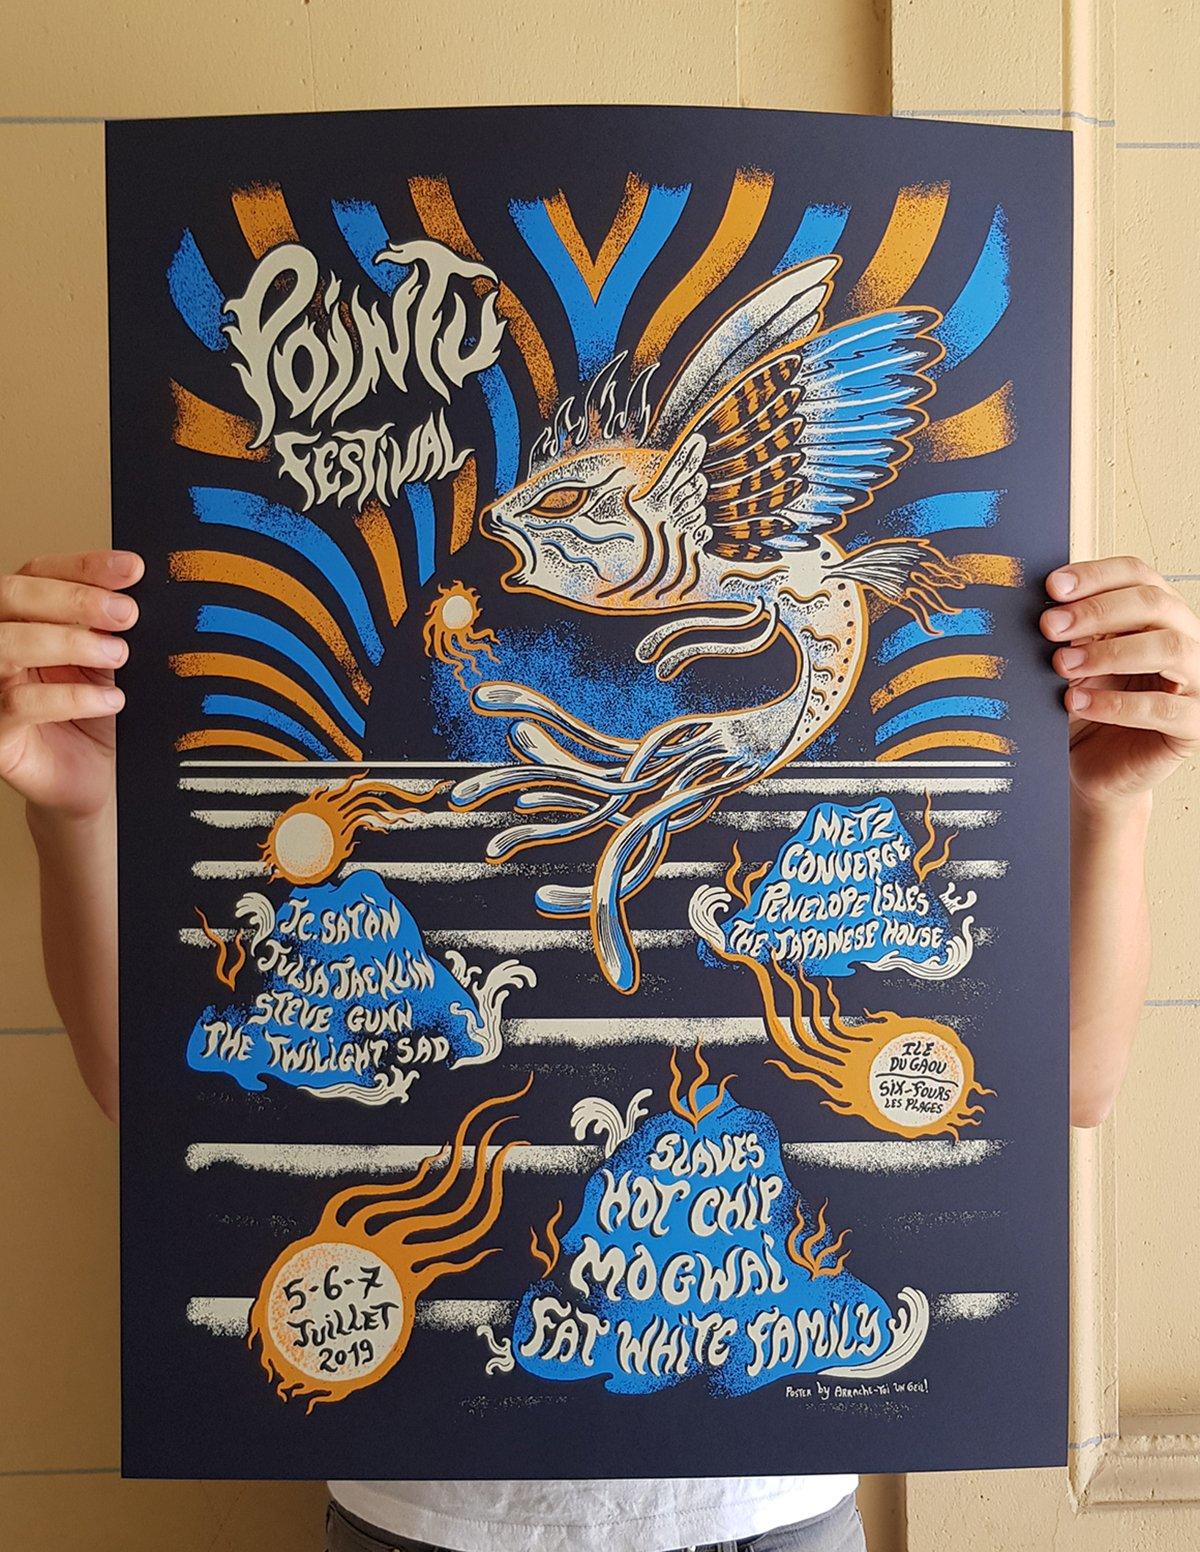 POINTU FESTIVAL (2019) screenprinted poster